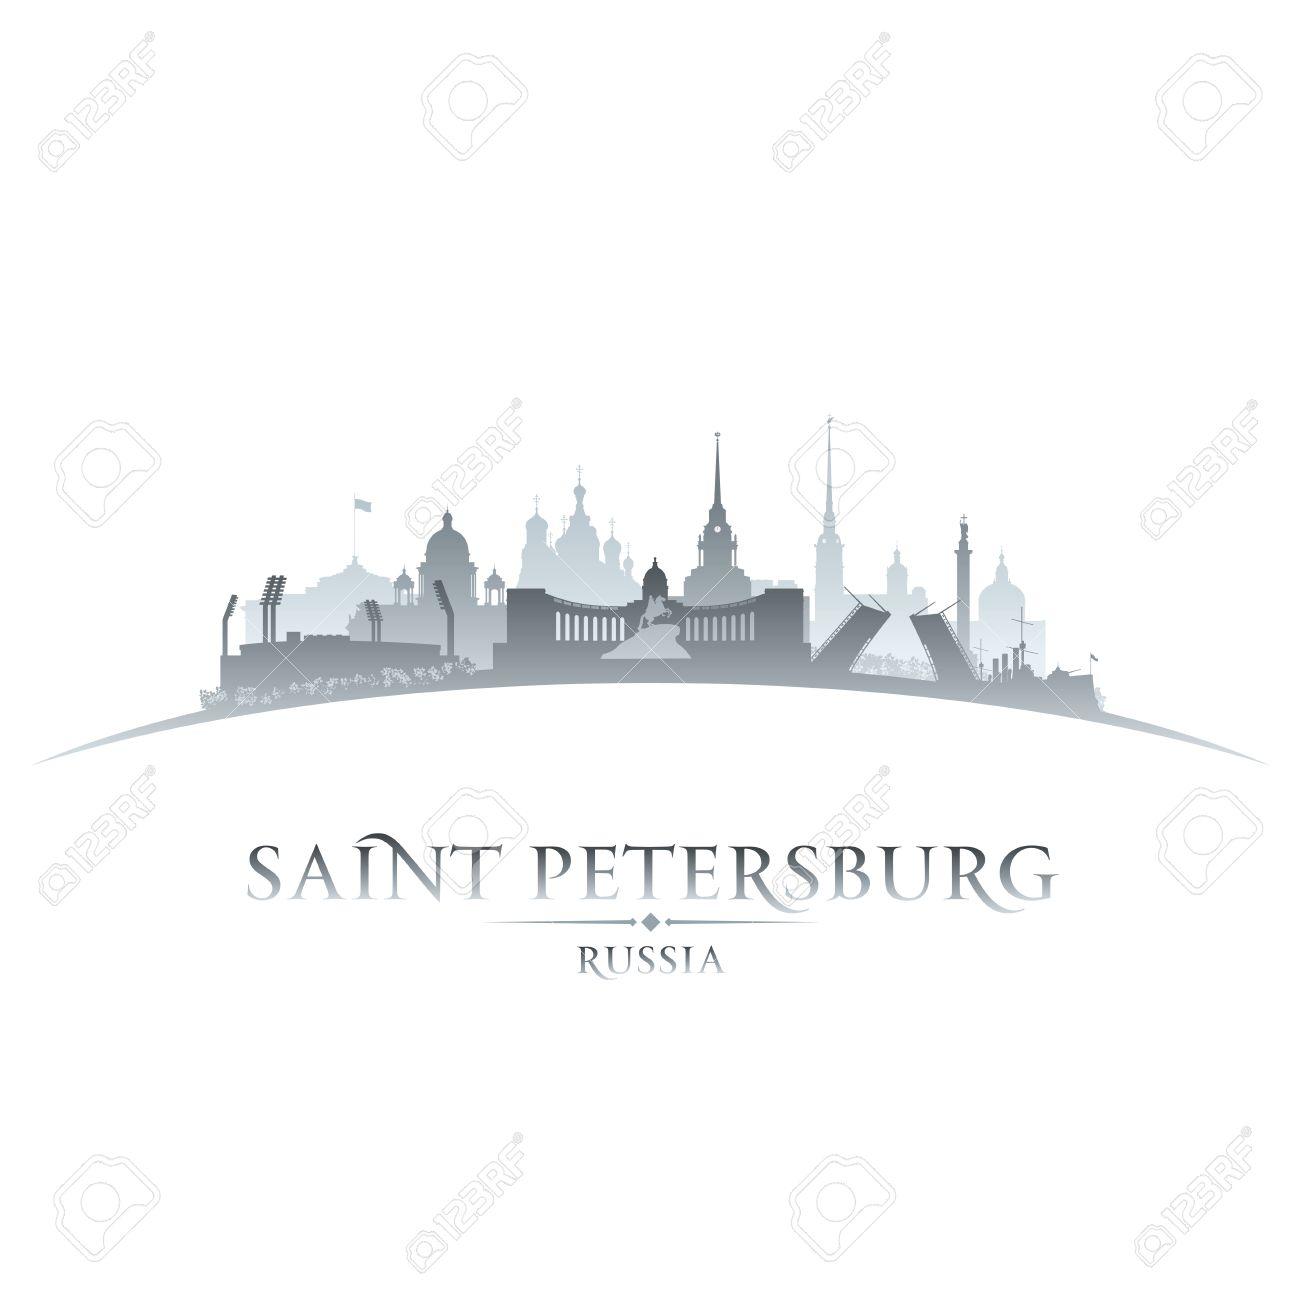 Saint Petersburg Russia city skyline silhouette. Vector illustration Stock Vector - 24510298